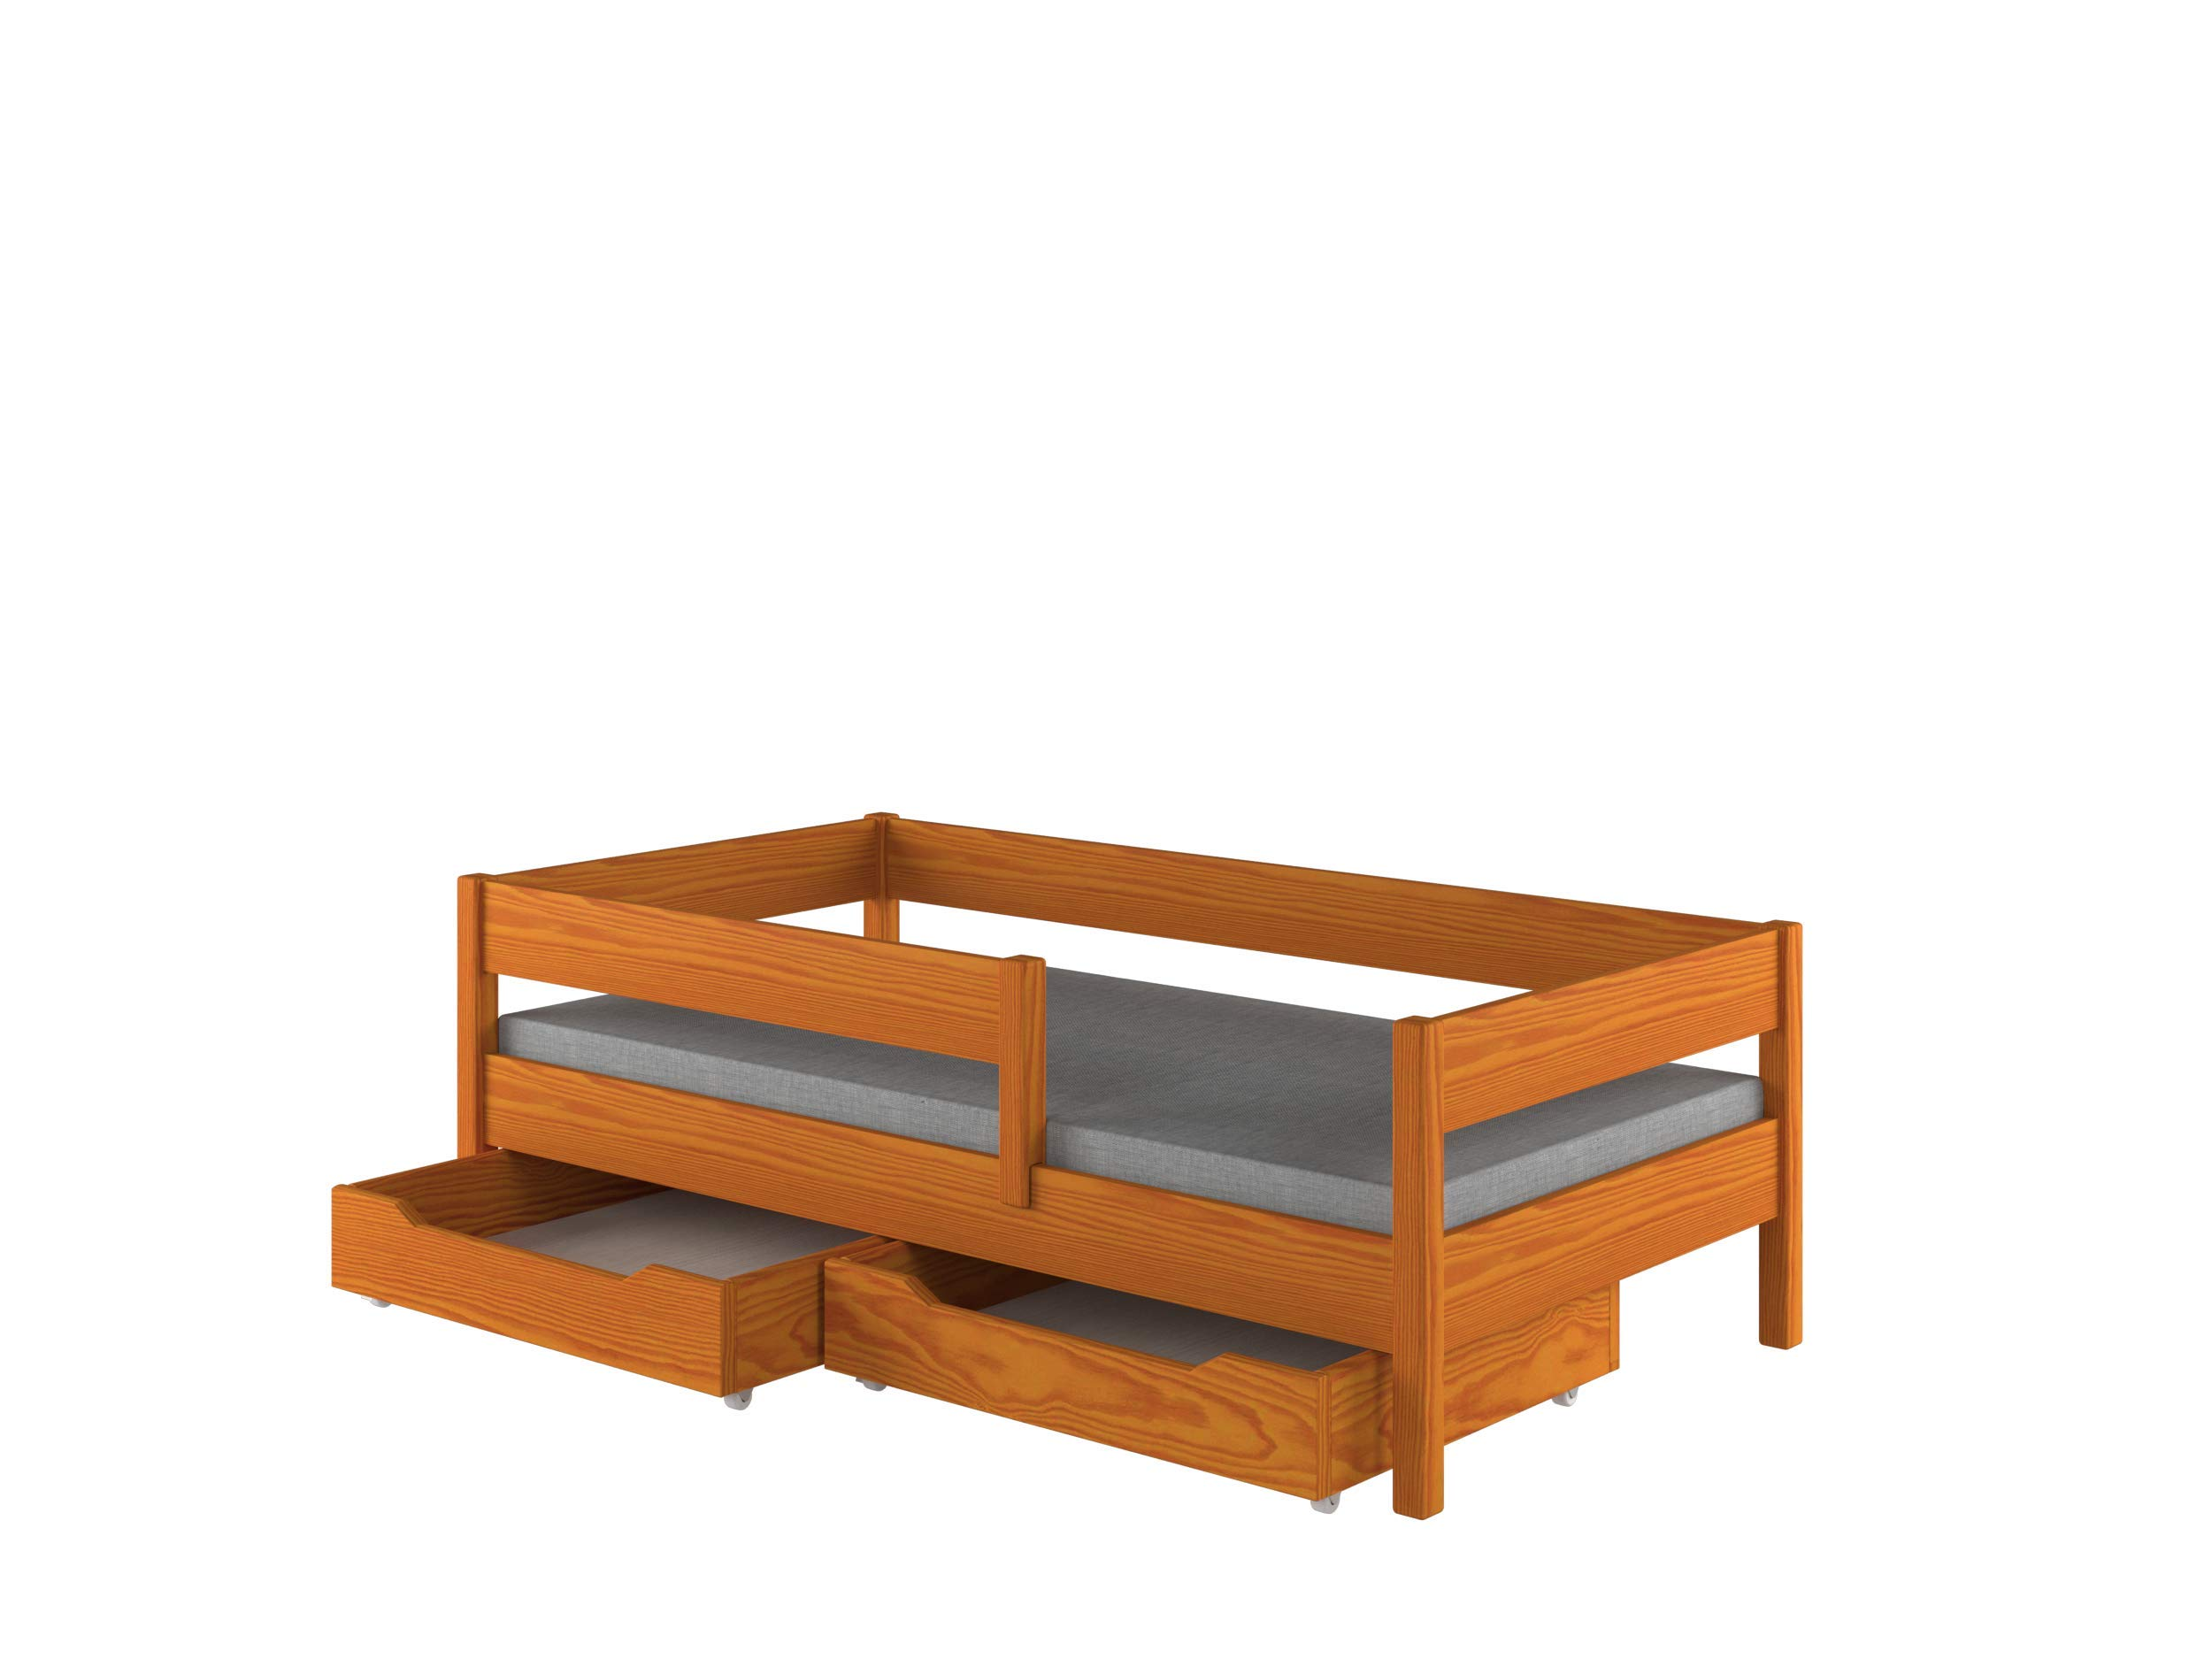 Children S Beds Home Single Beds For Kid Buy Online In Macedonia At Desertcart